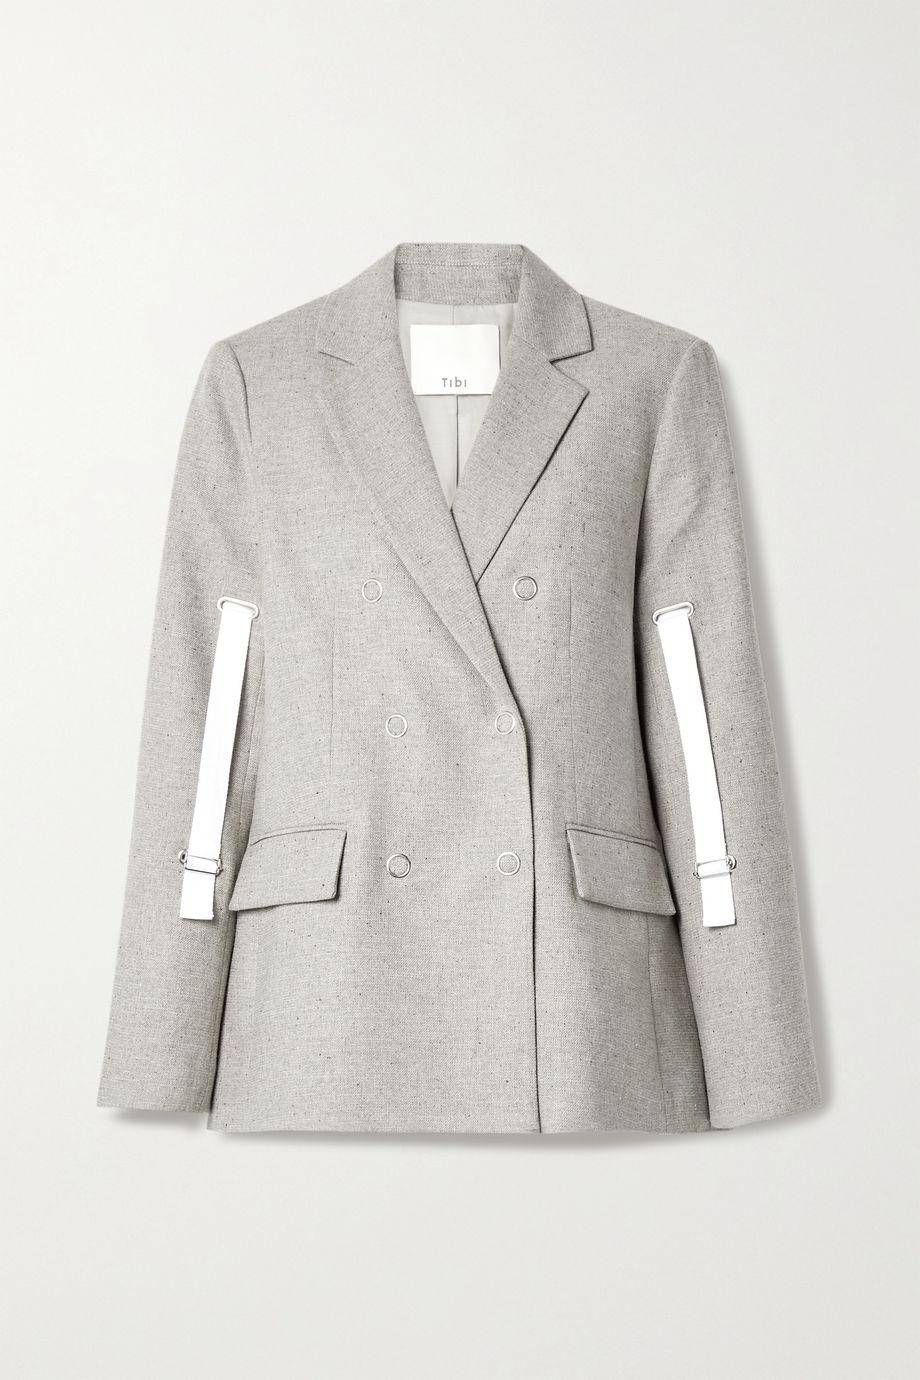 Tibi Lola canvas-trimmed tweed blazer